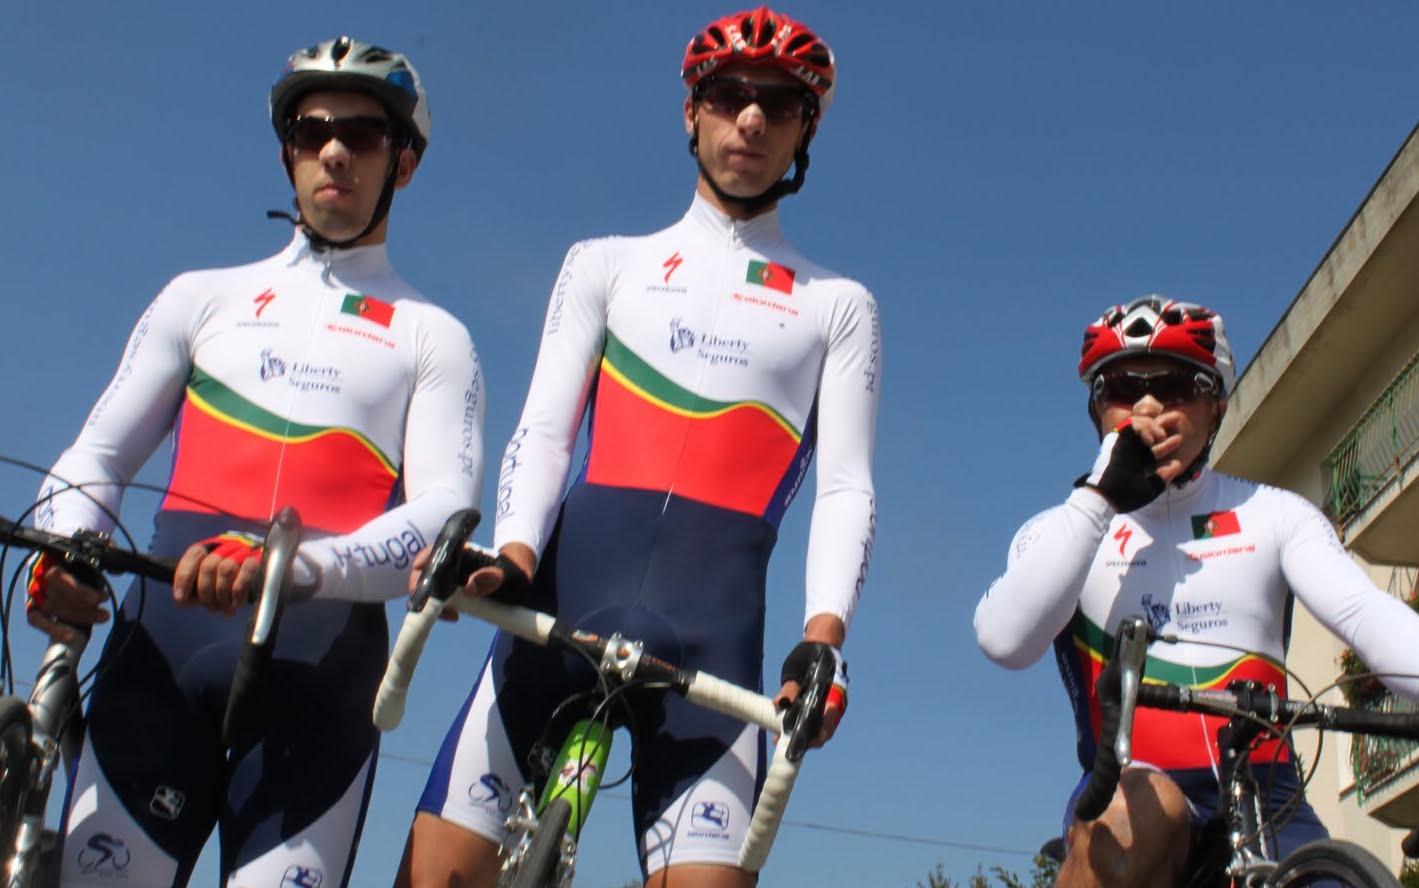 2016 World Intellectual Impairment Sport World Cycling Championships